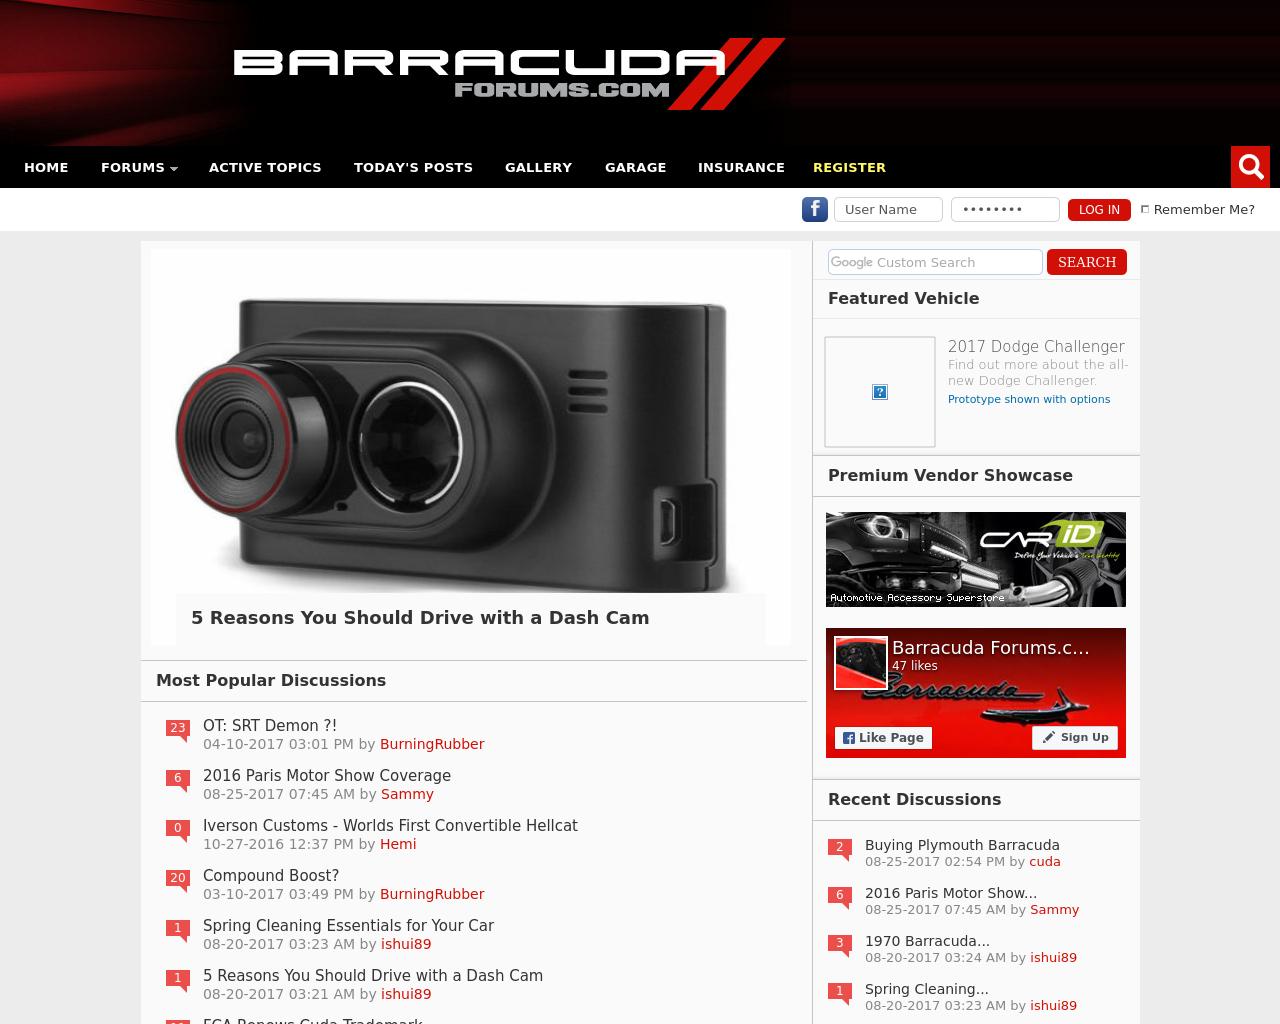 Barracuda-Forums-Advertising-Reviews-Pricing